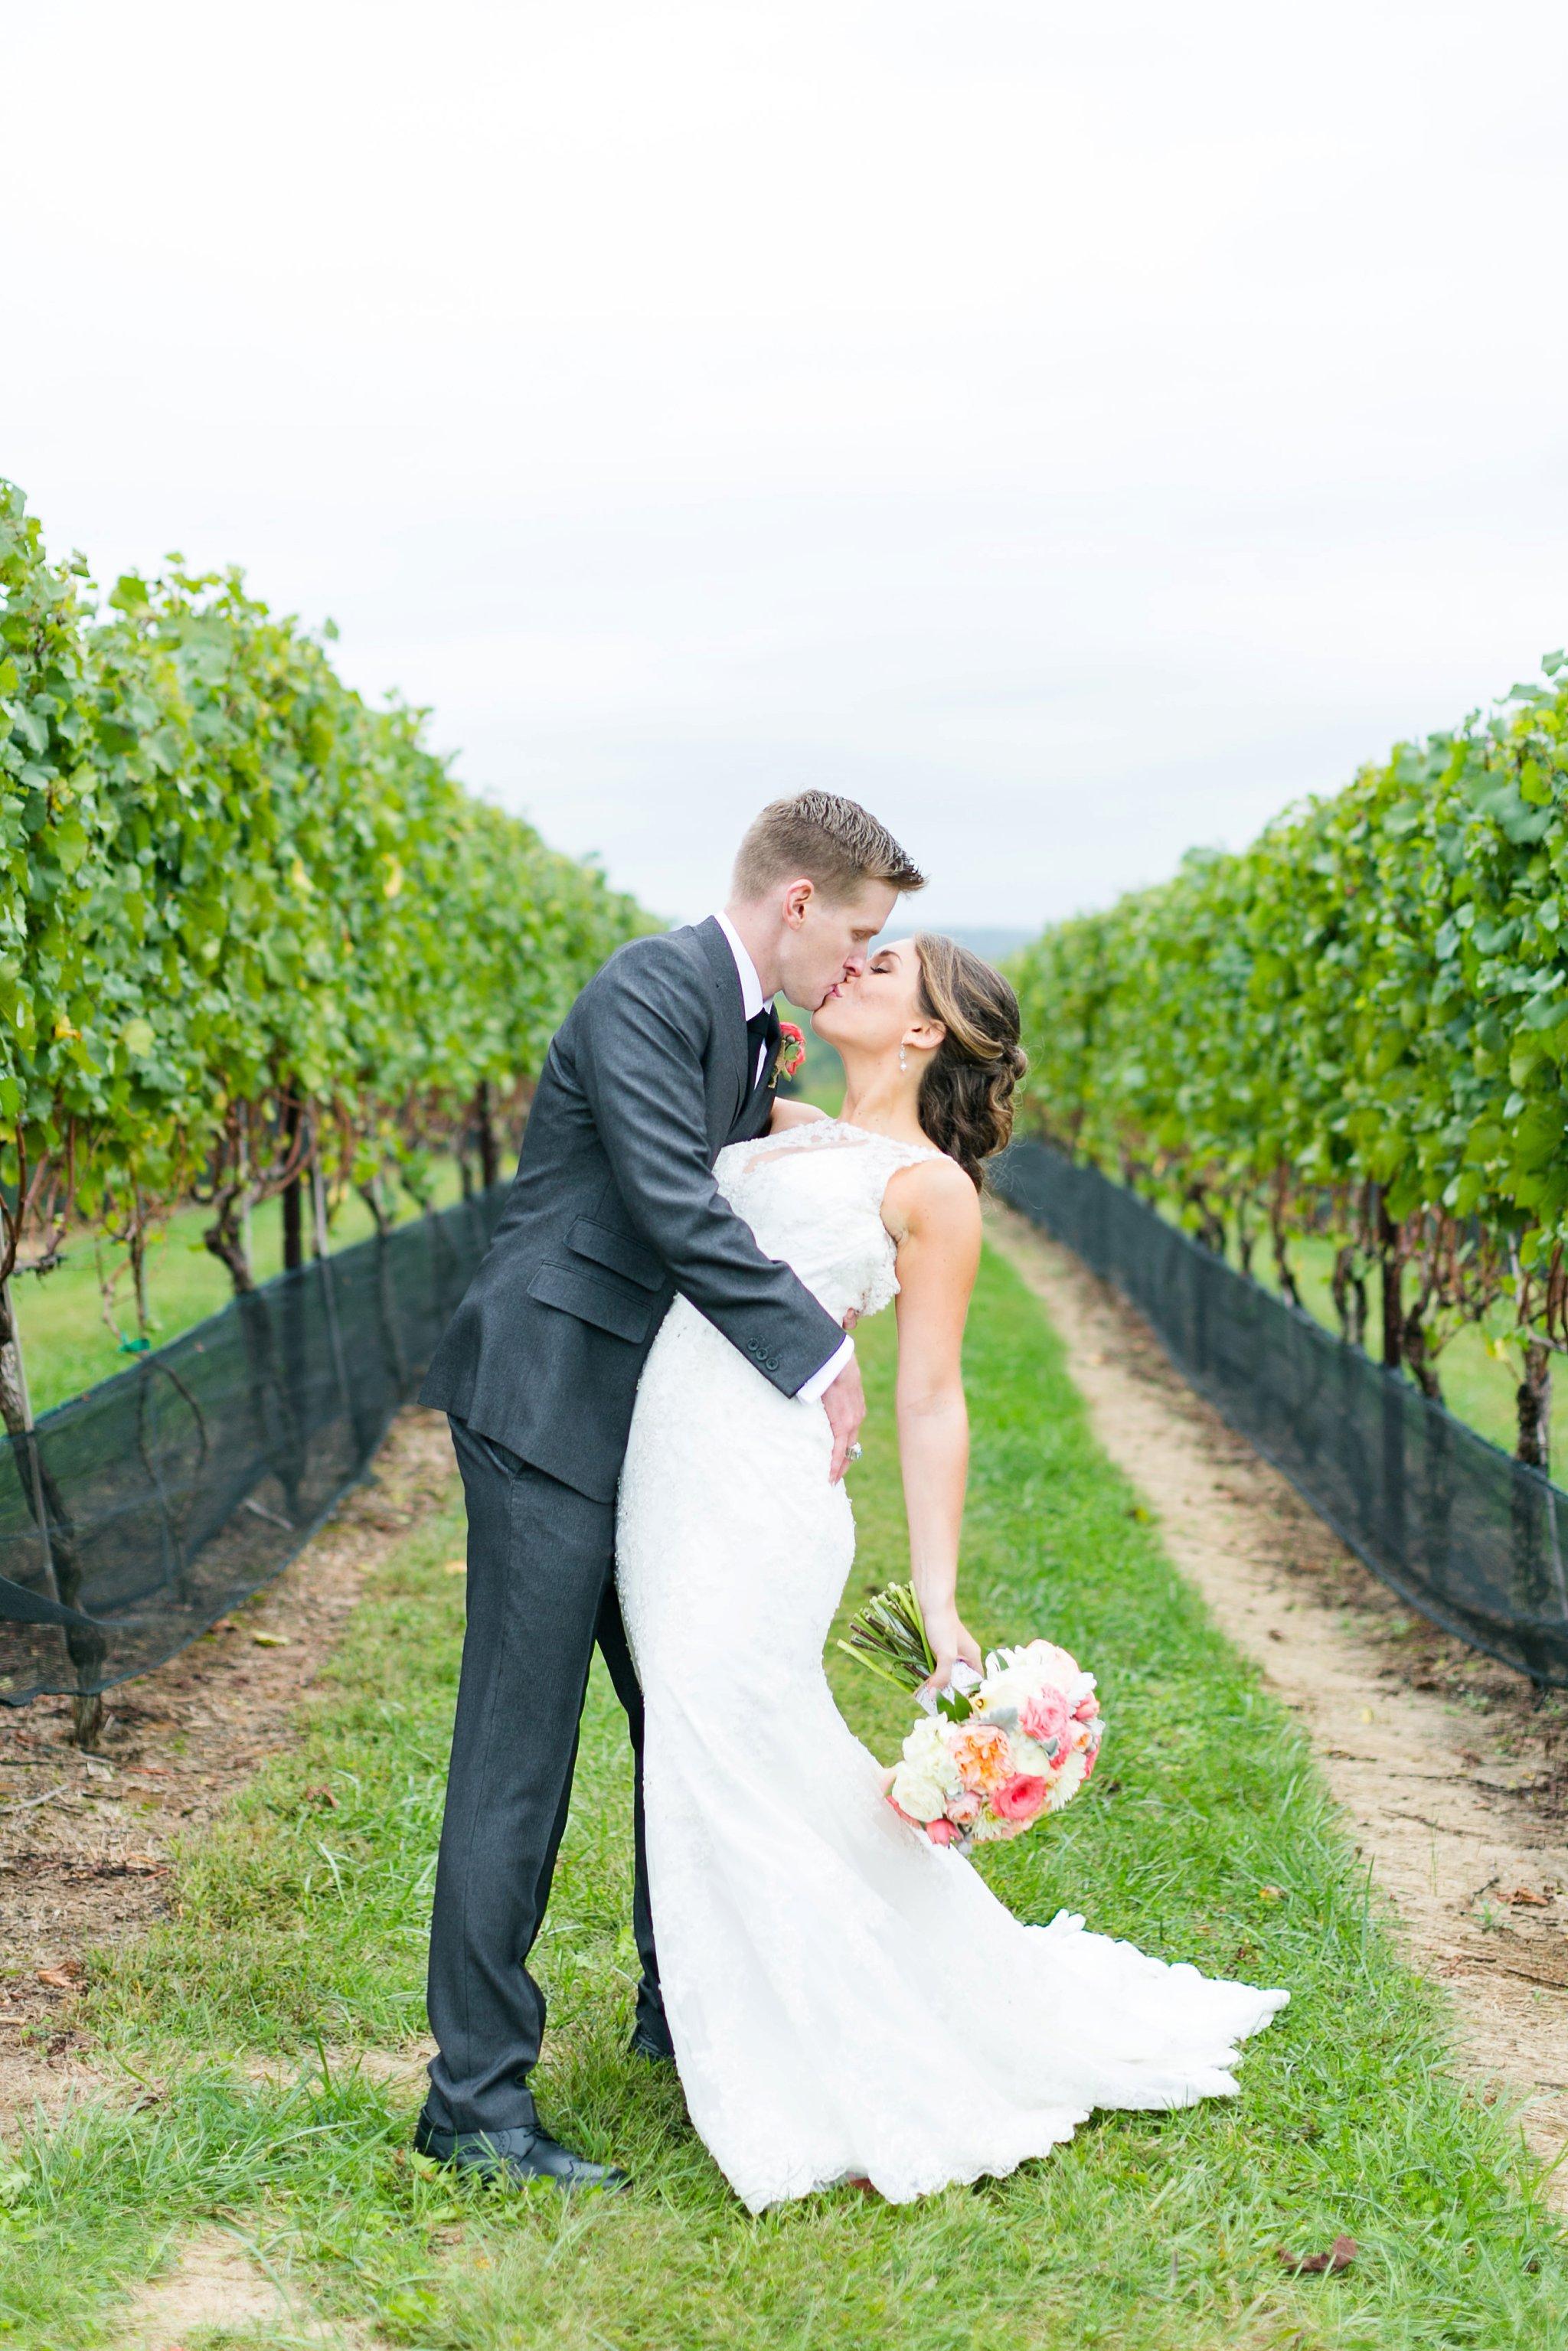 Stone Tower Winery Wedding Photos Virginia Wedding Photographer Megan Kelsey Photography Sam & Angela-216.jpg